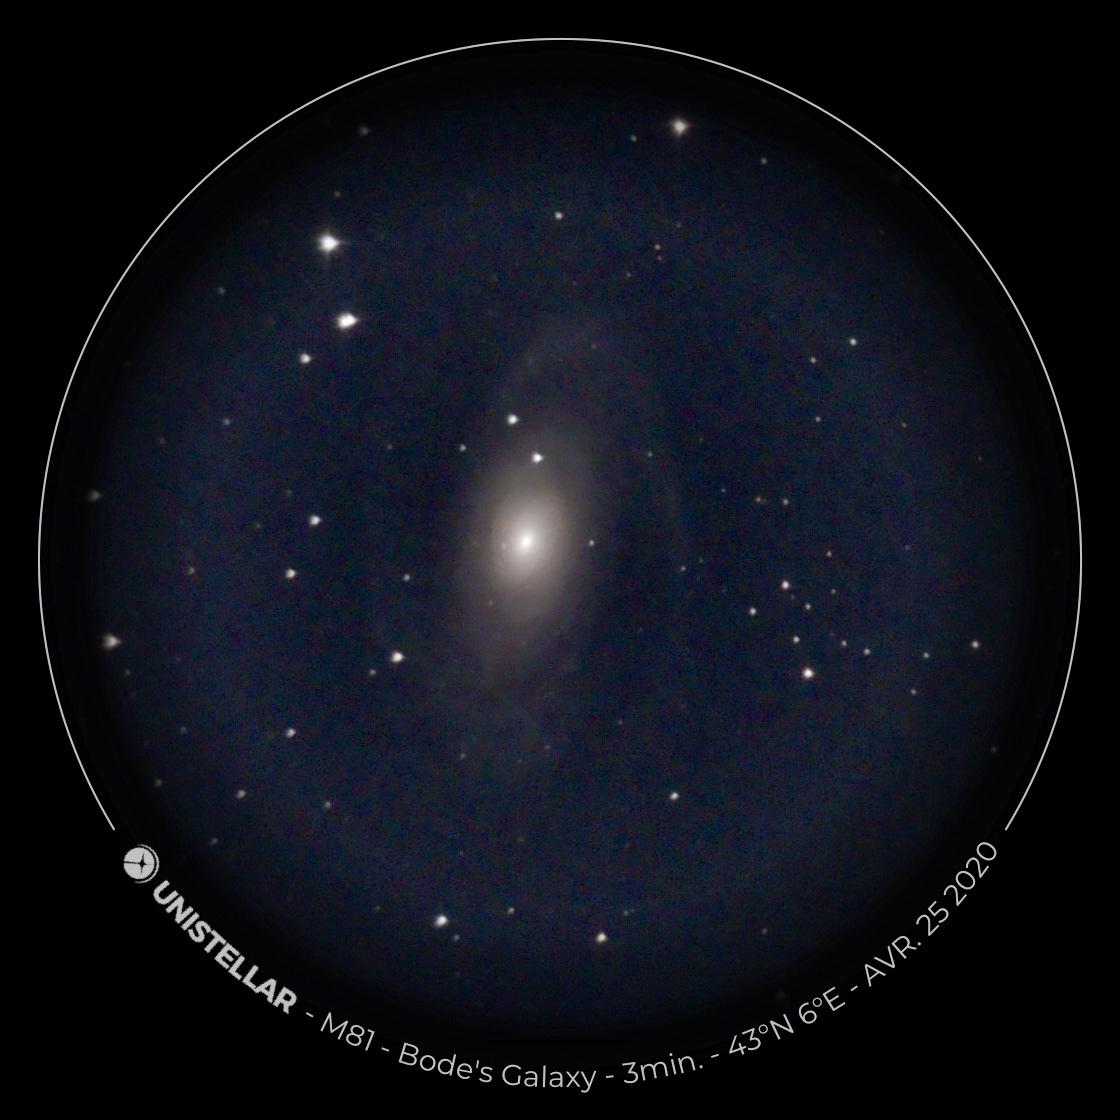 eVscope-20200425-201840.jpg